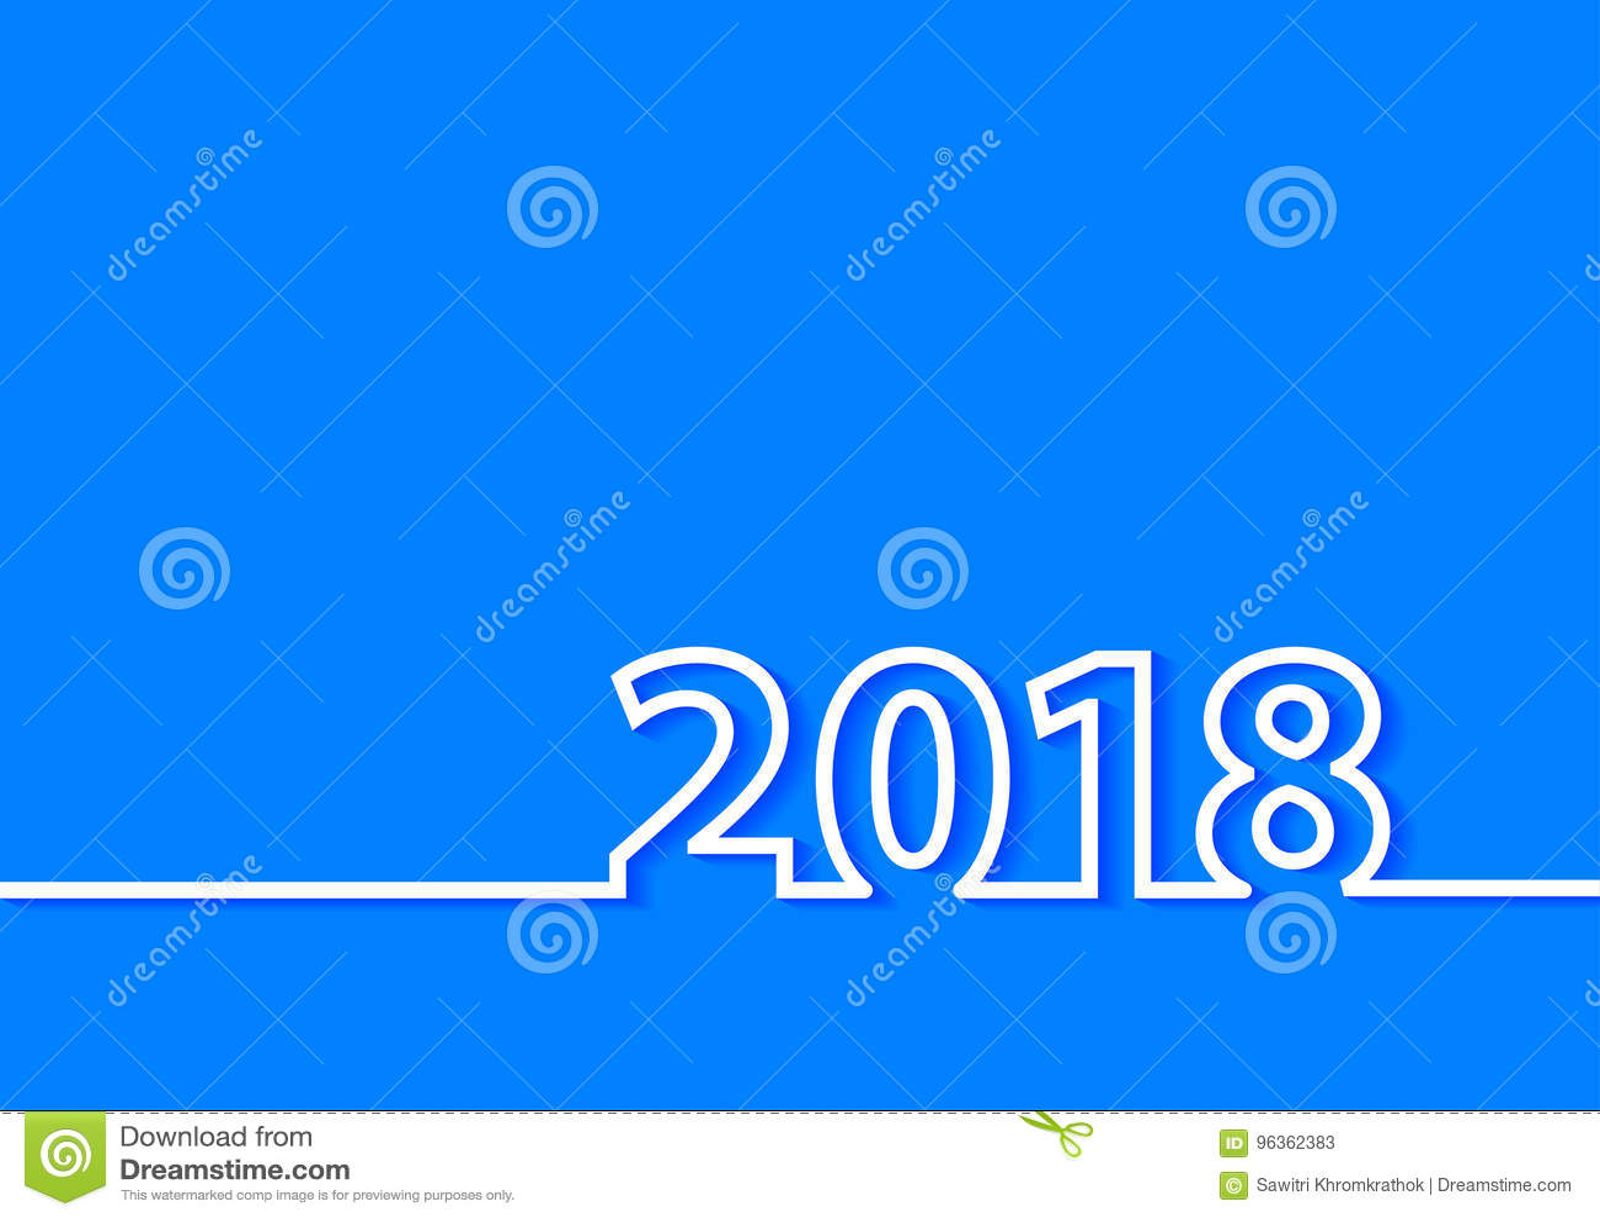 Vector 2018 Happy New Year Creative Design Stock Vector